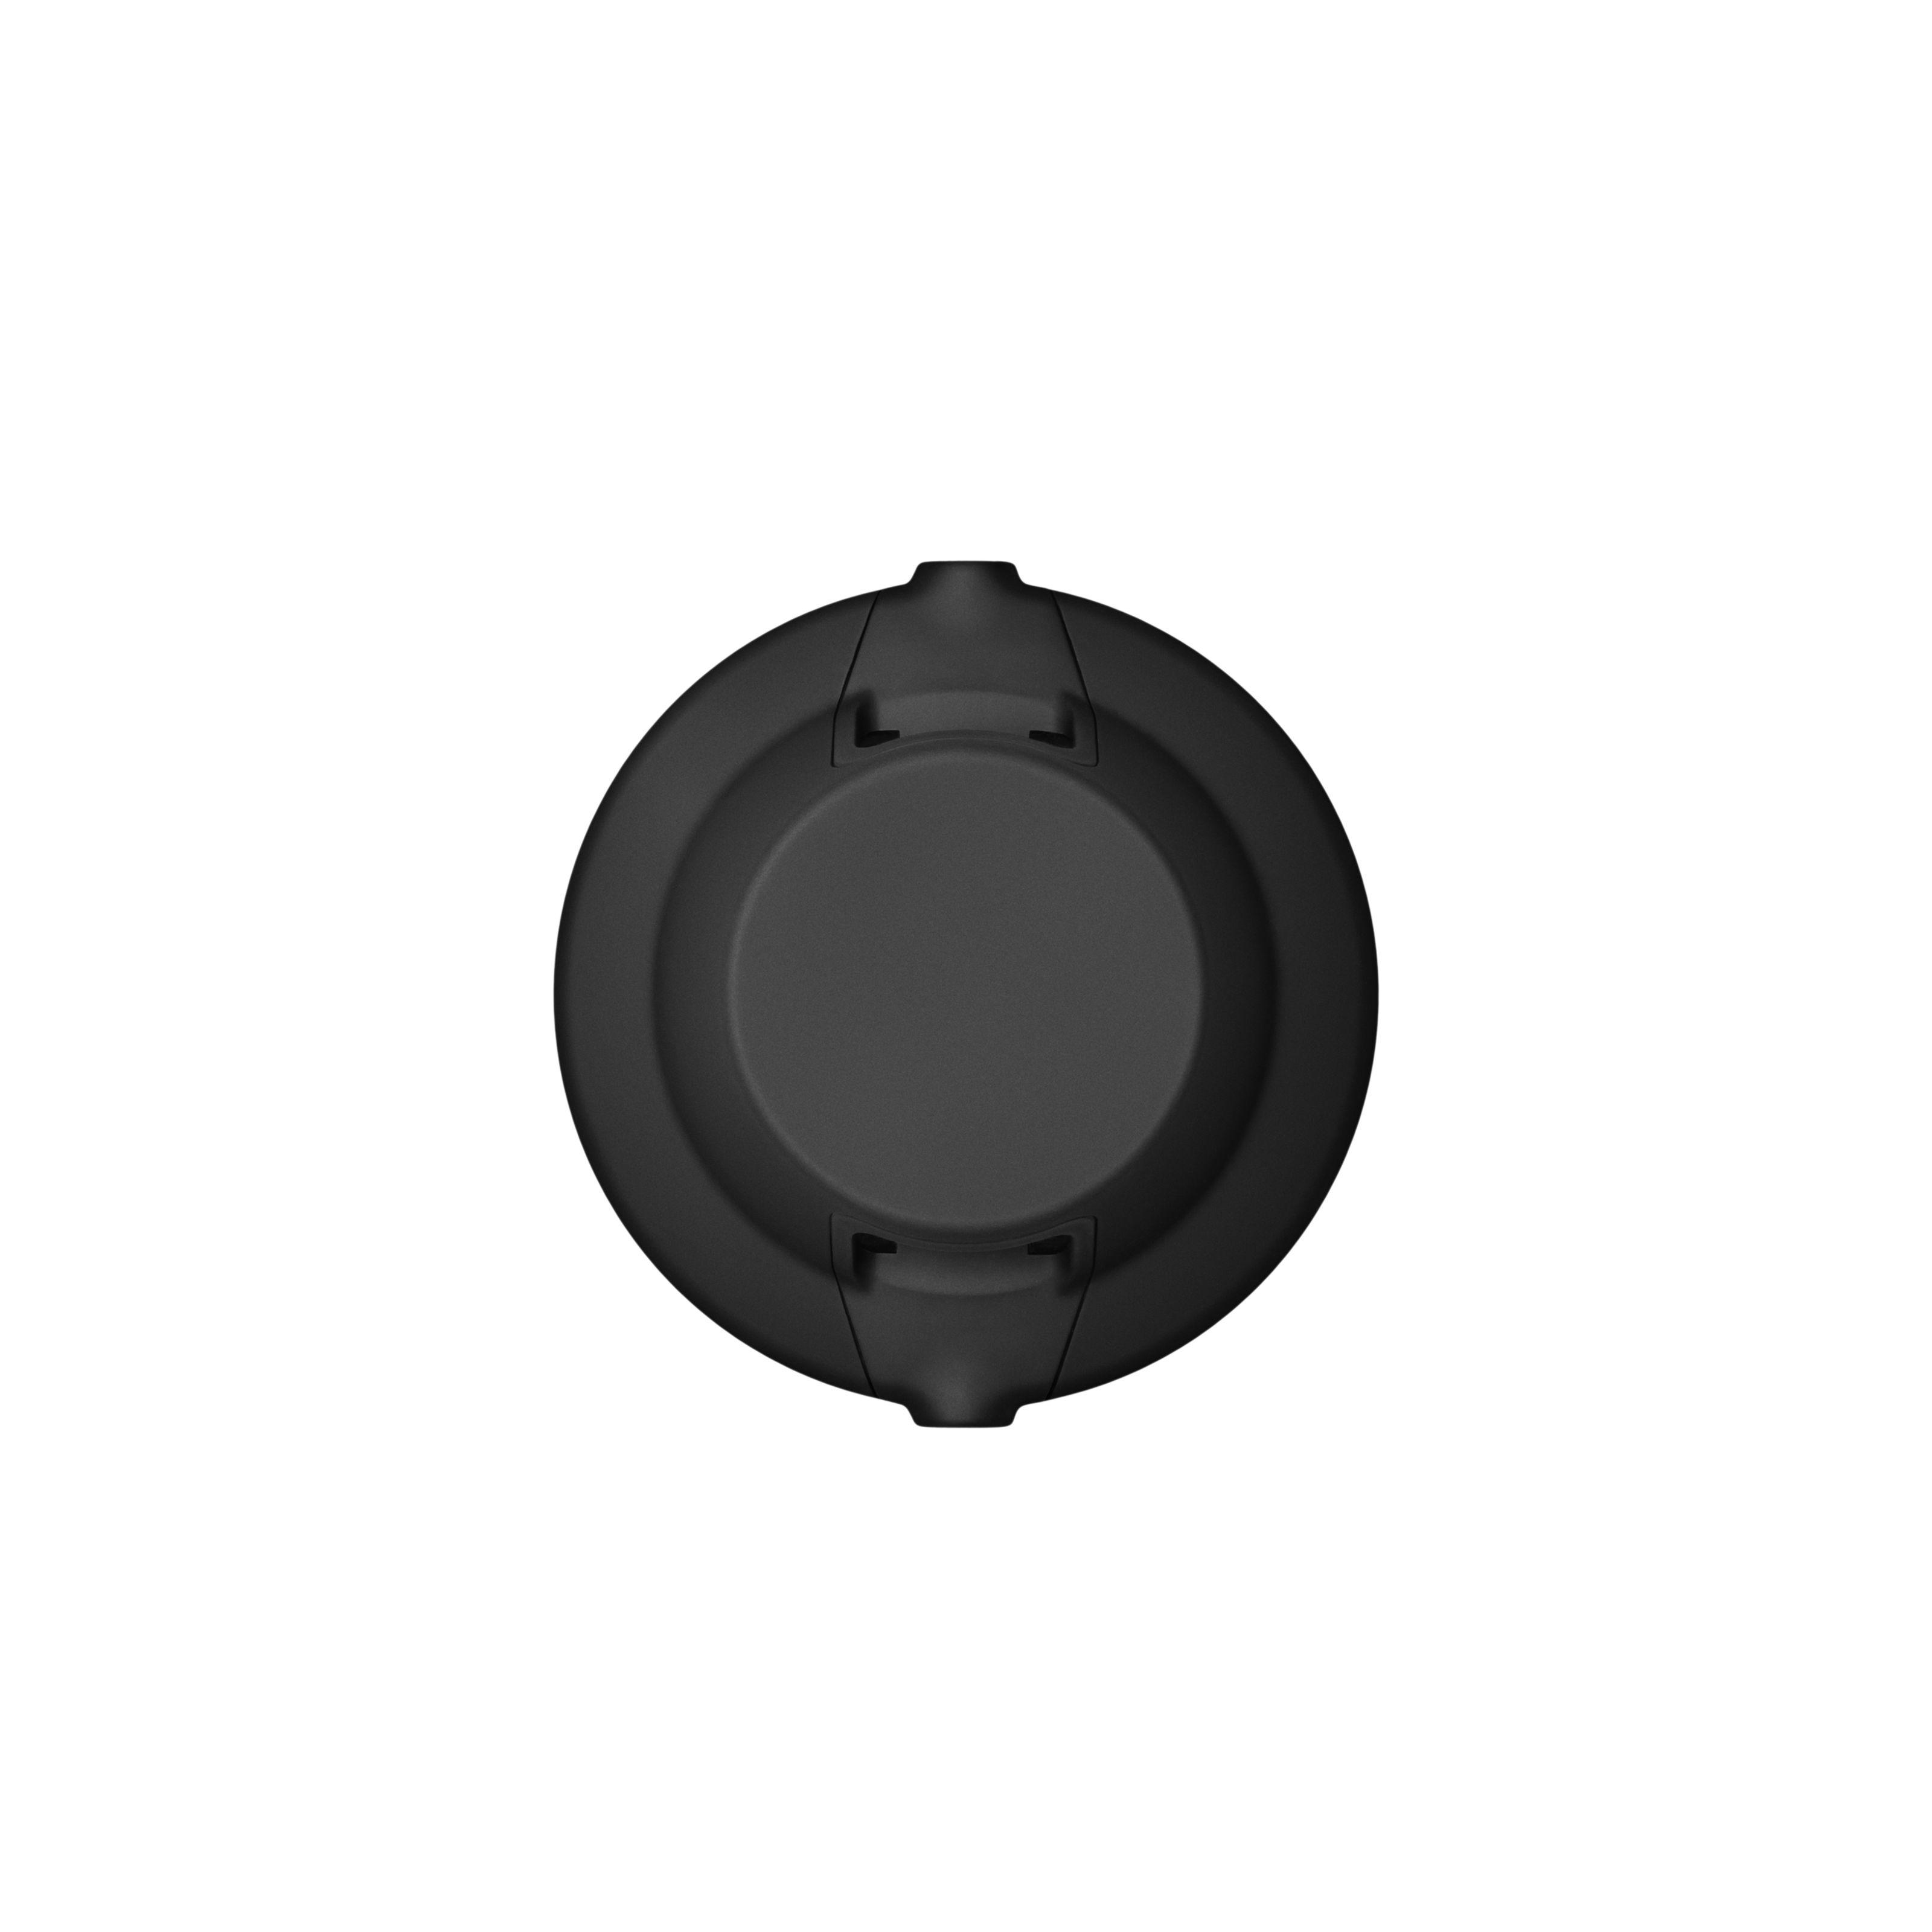 Aiaiai - S04 - Vibrant Speaker Units for TMA-2 10-90051